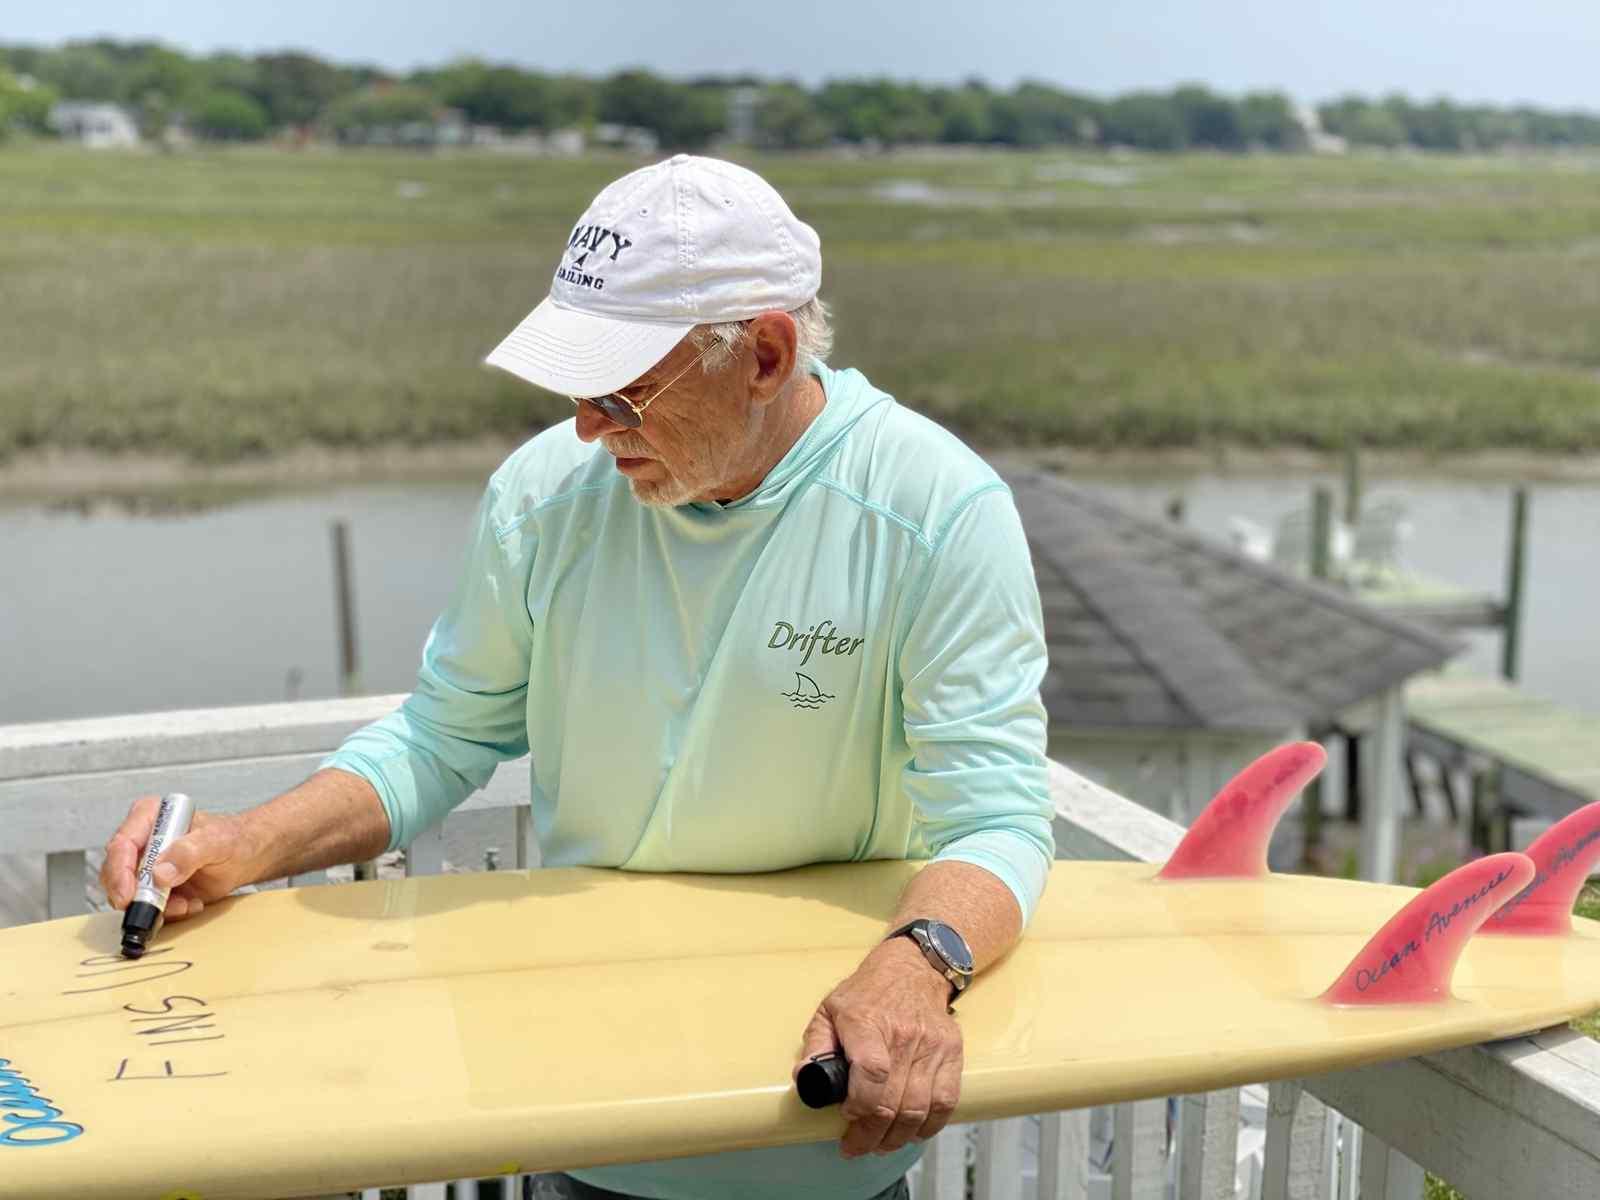 Autographed surf boards benefit Warrior Surf Foundation